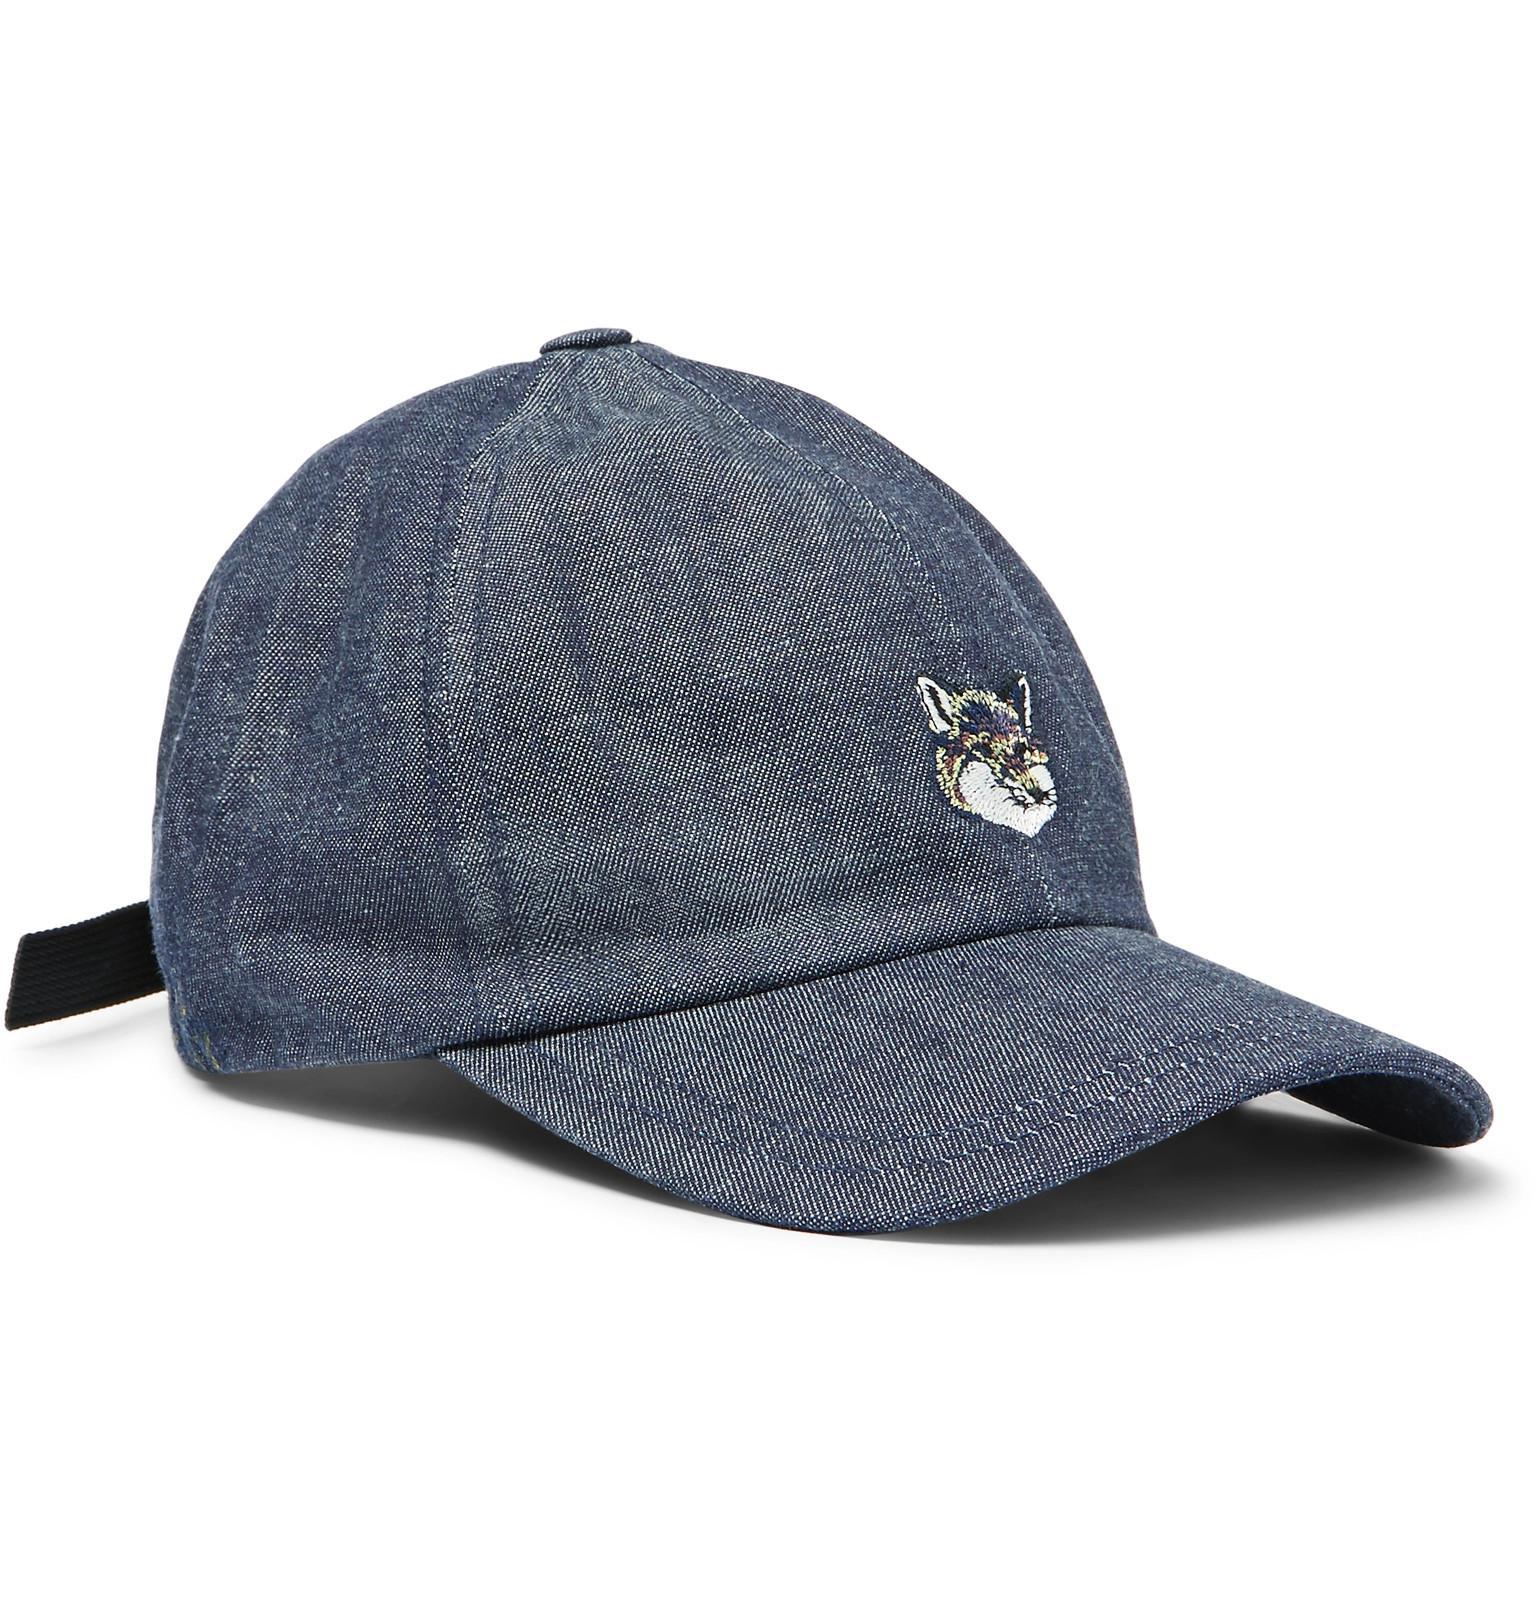 8fce87a211e138 Maison Kitsuné Embroidered Denim Cap in Blue for Men - Lyst